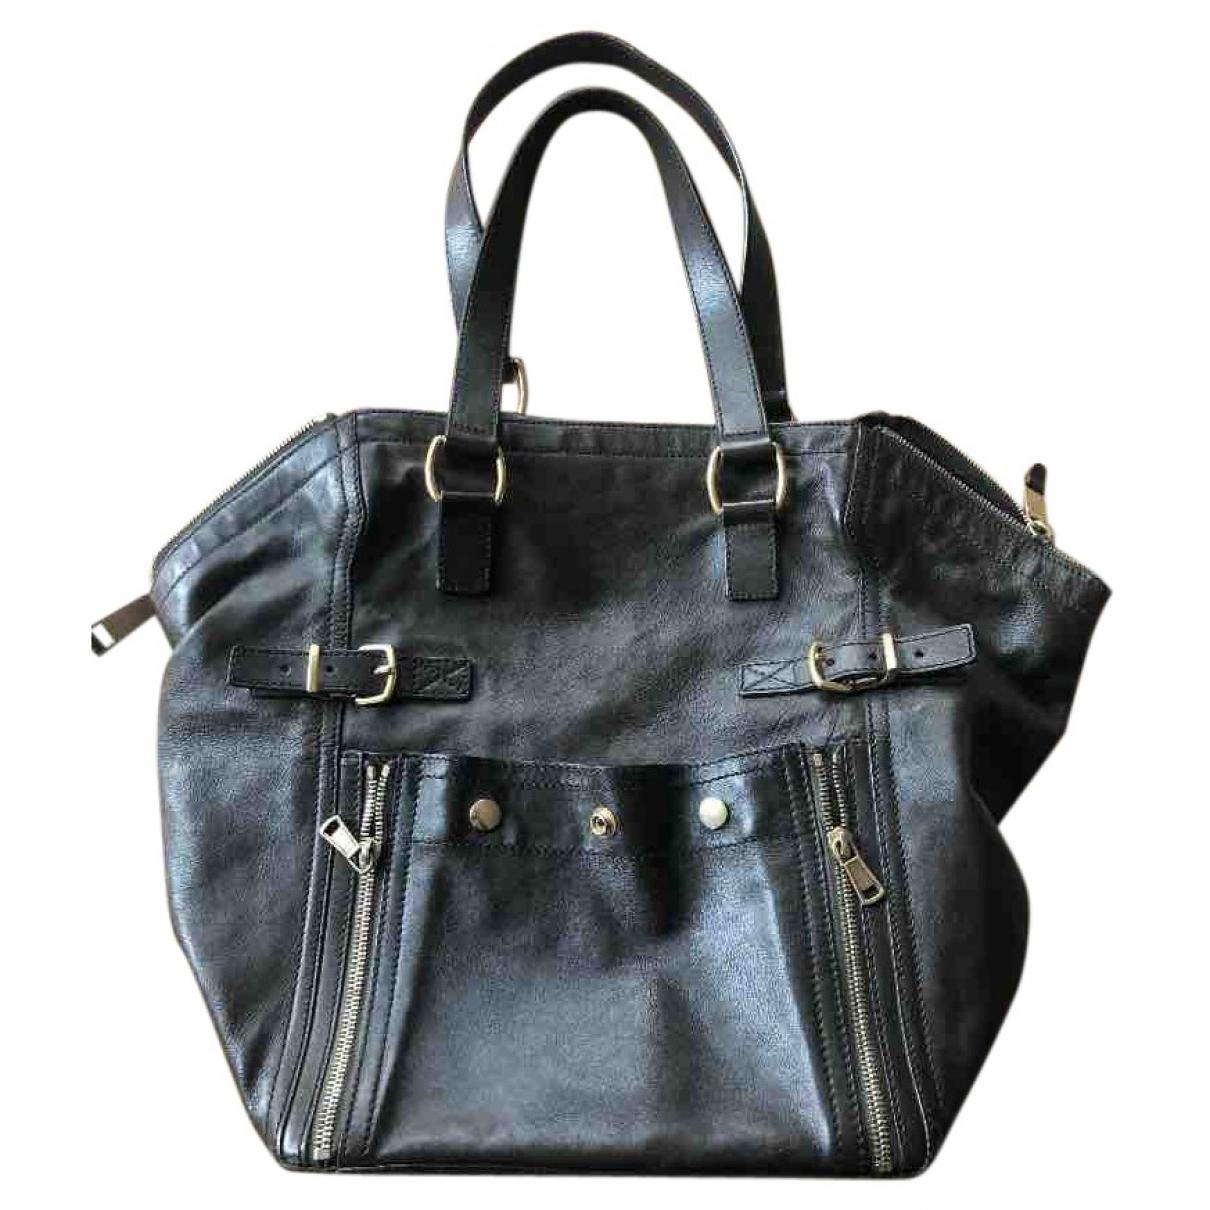 Yves Saint Laurent Downtown Handtasche in  Braun Leder